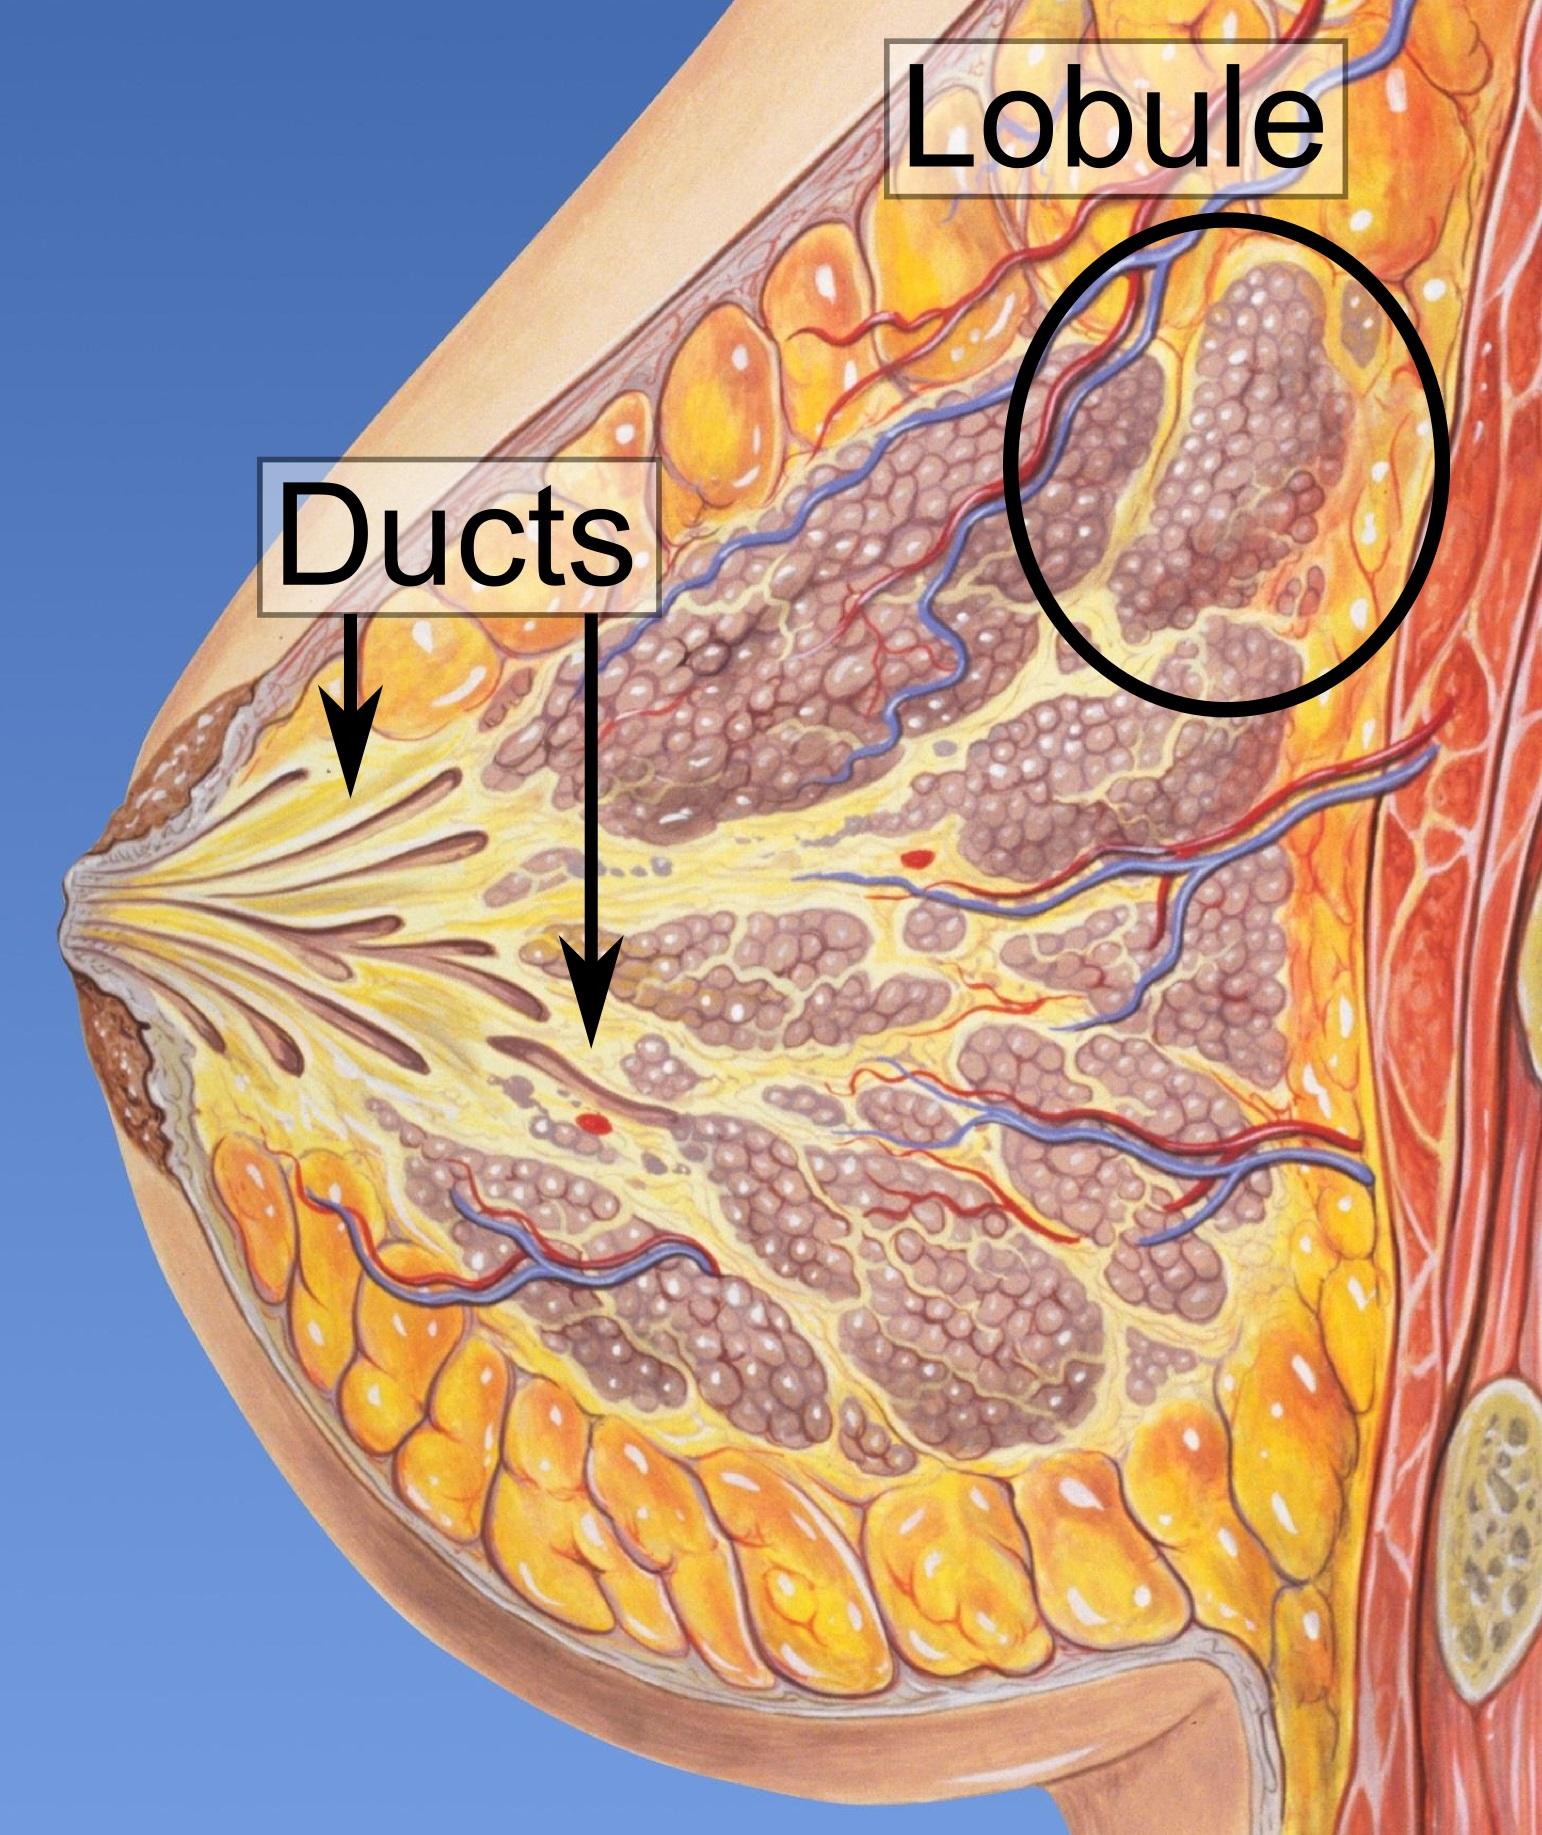 whats ductal papilloma intraductal papilloma ck5 6